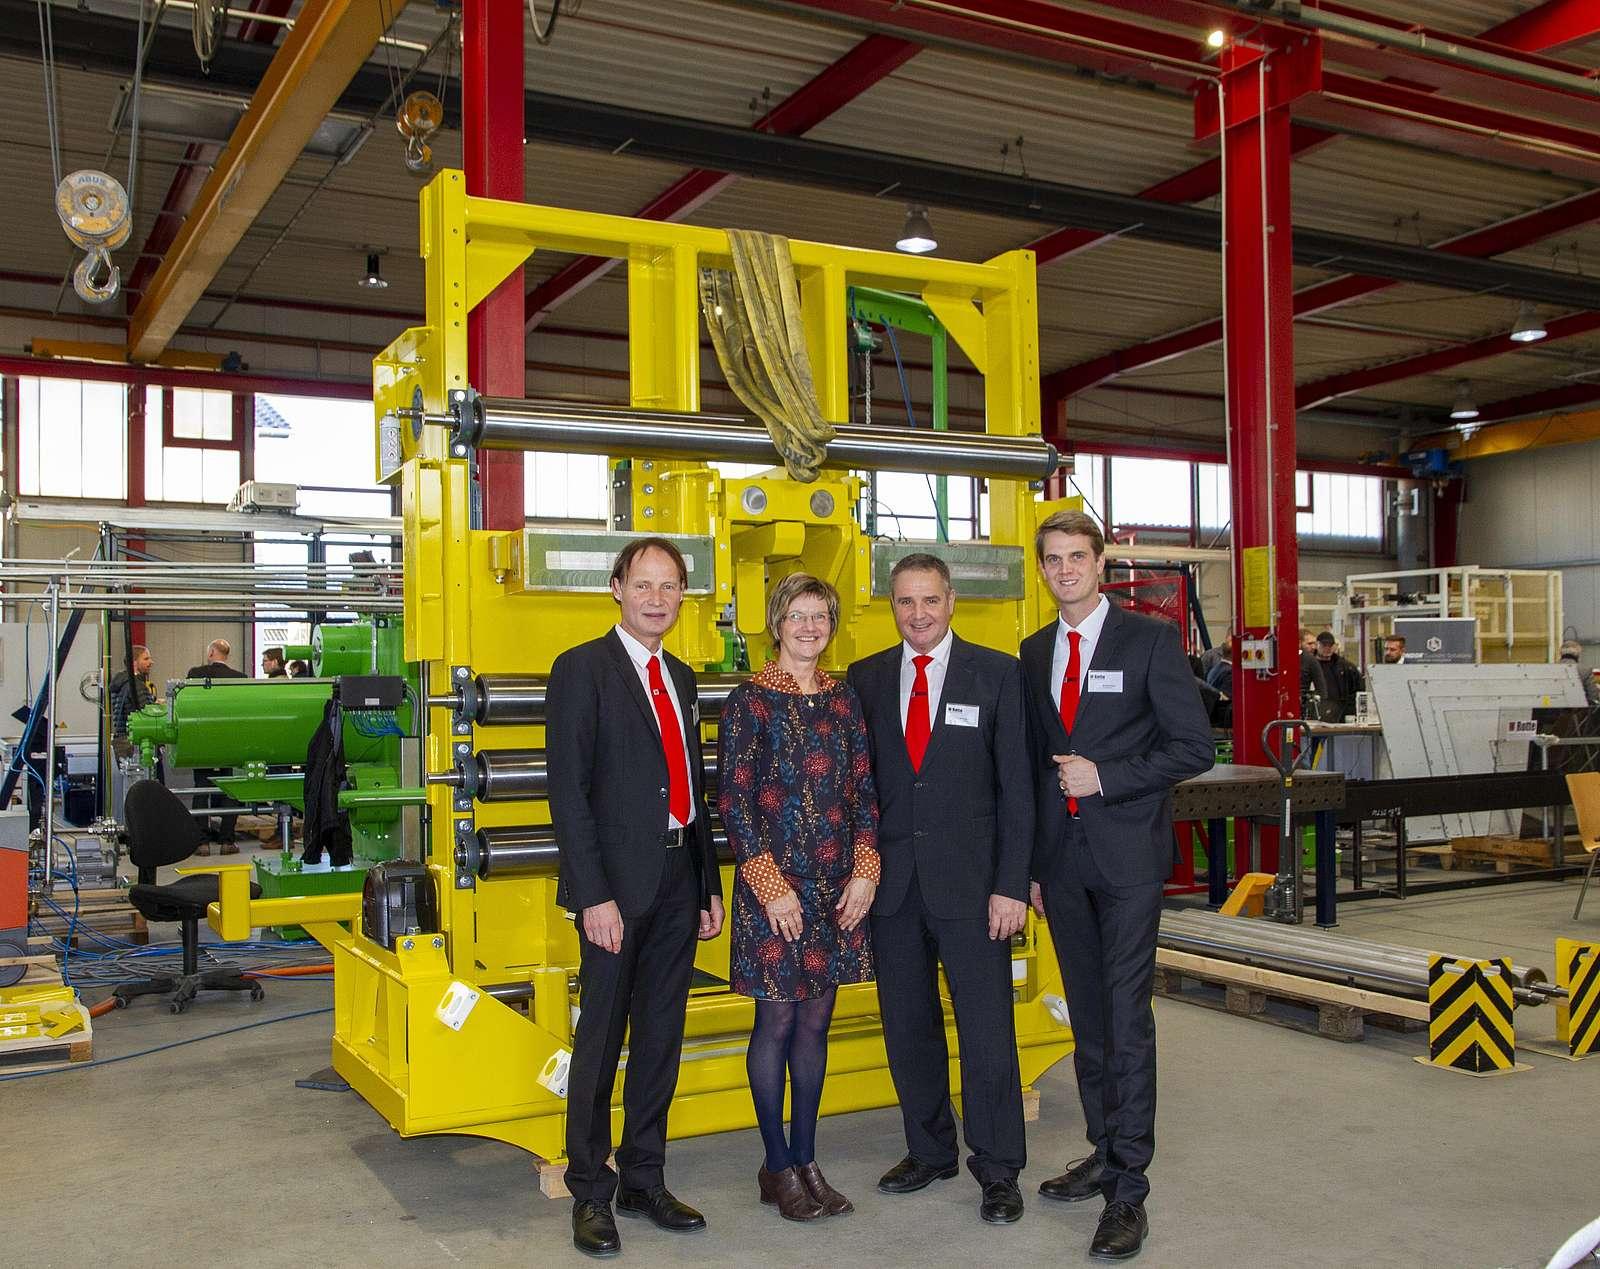 Produktschautag 2019: Dr. Franz-Barthold Gockel, Brigitte Rotte, Ulrich Rotte, Benedikt Rotte